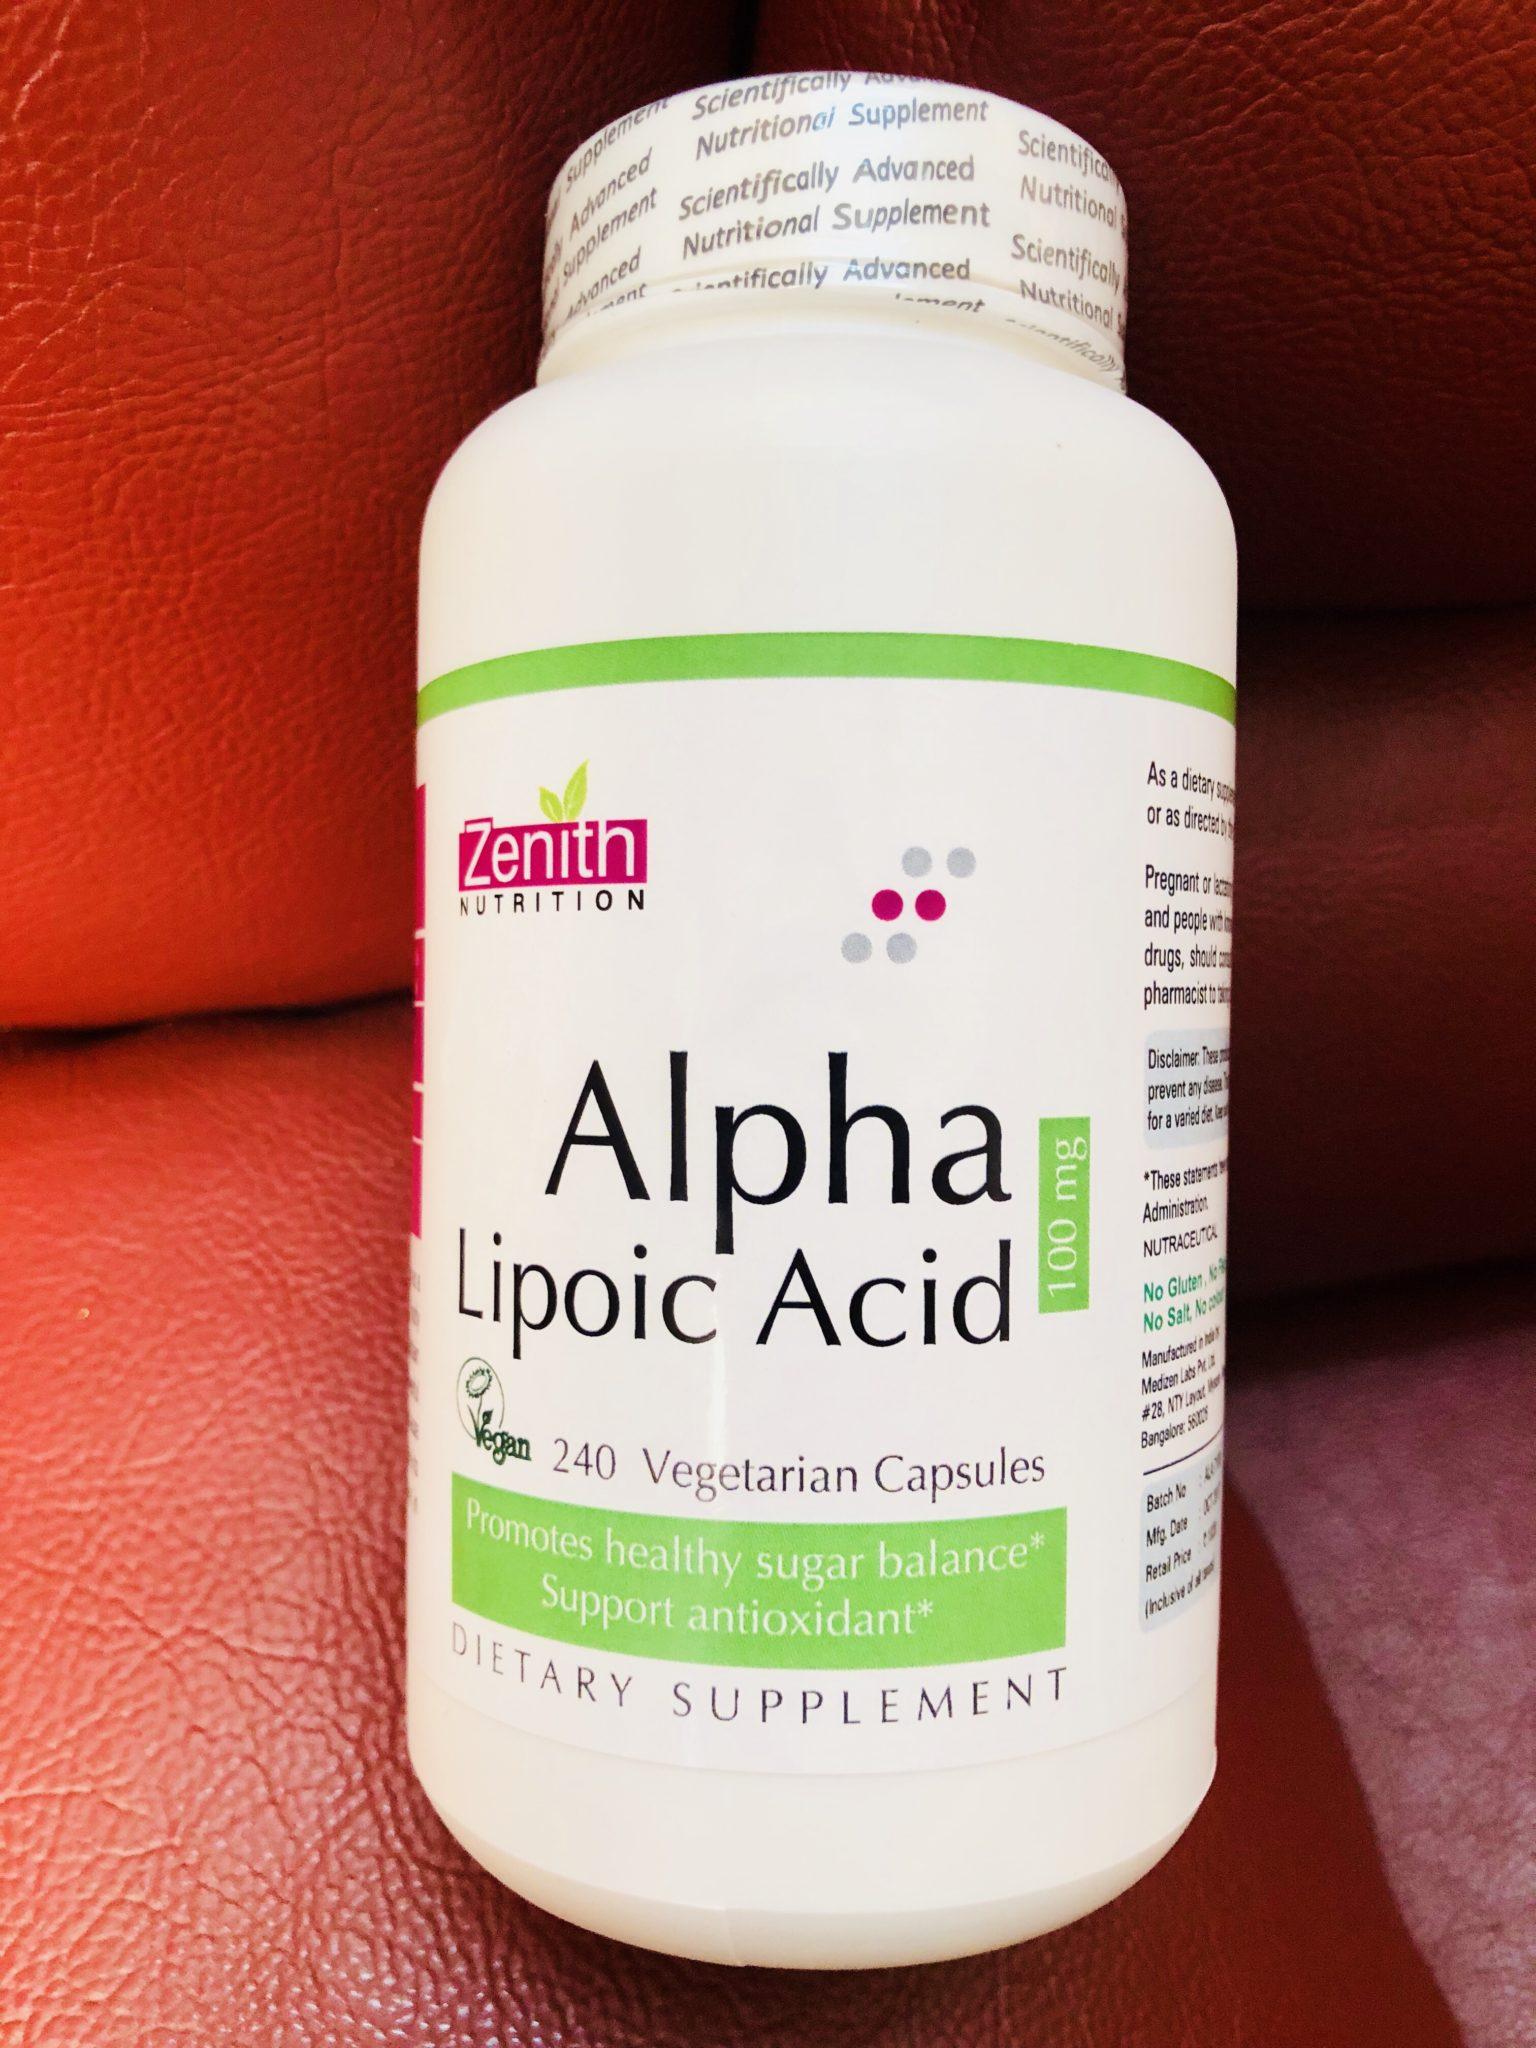 Zenith Nutrition Alpha Lipoic Acid Vegetarian Capsules